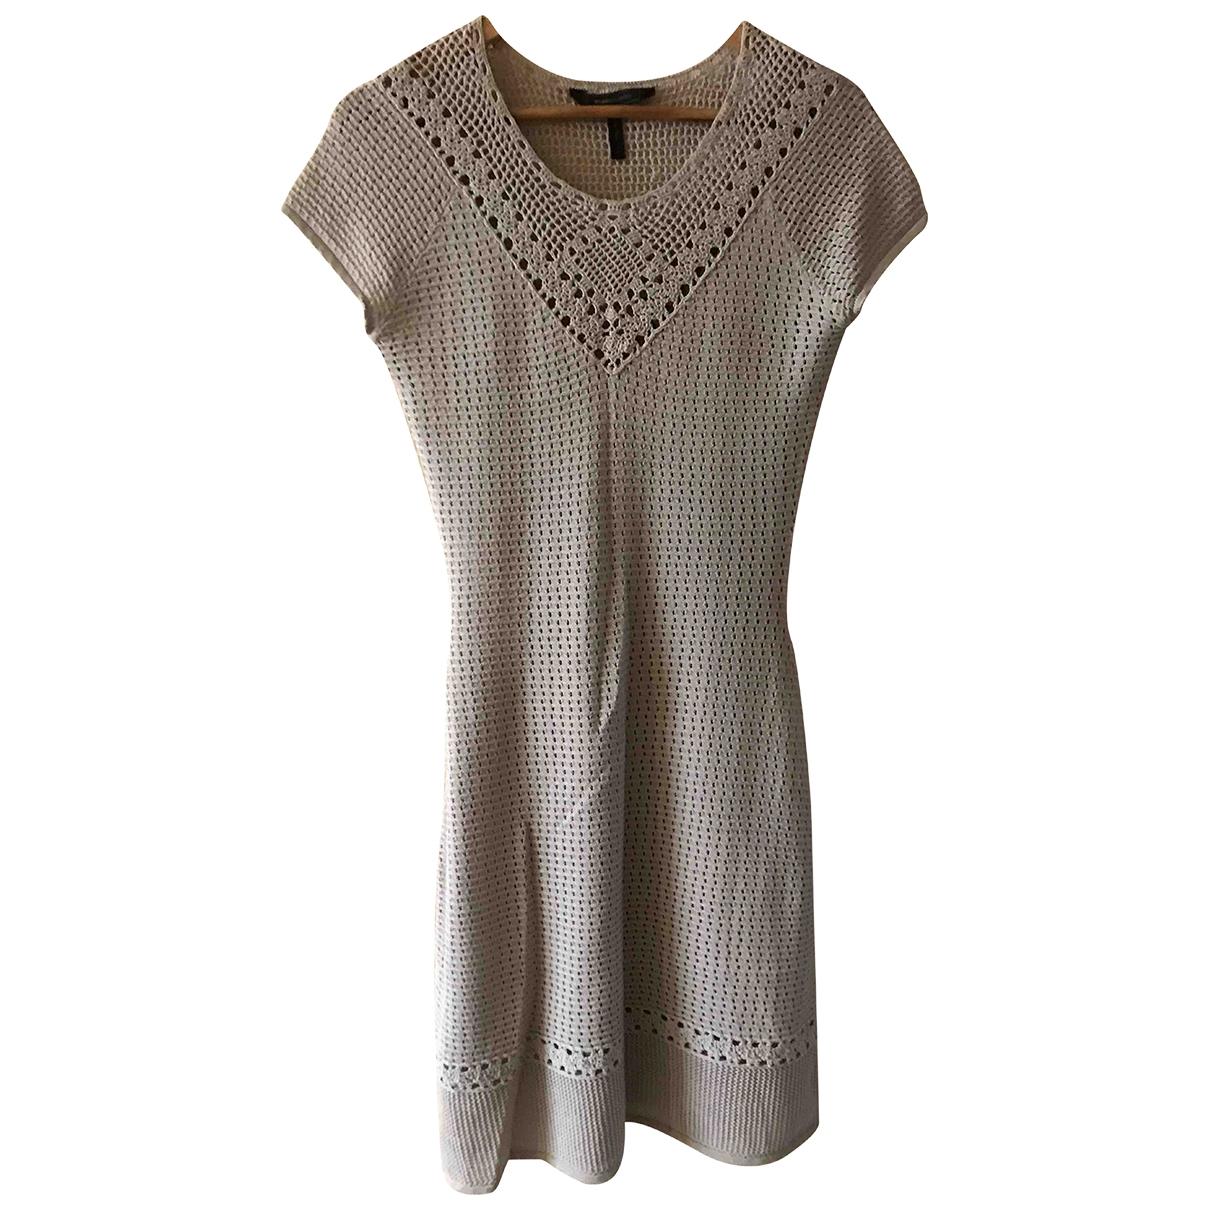 Bcbg Max Azria \N Kleid in  Beige Baumwolle